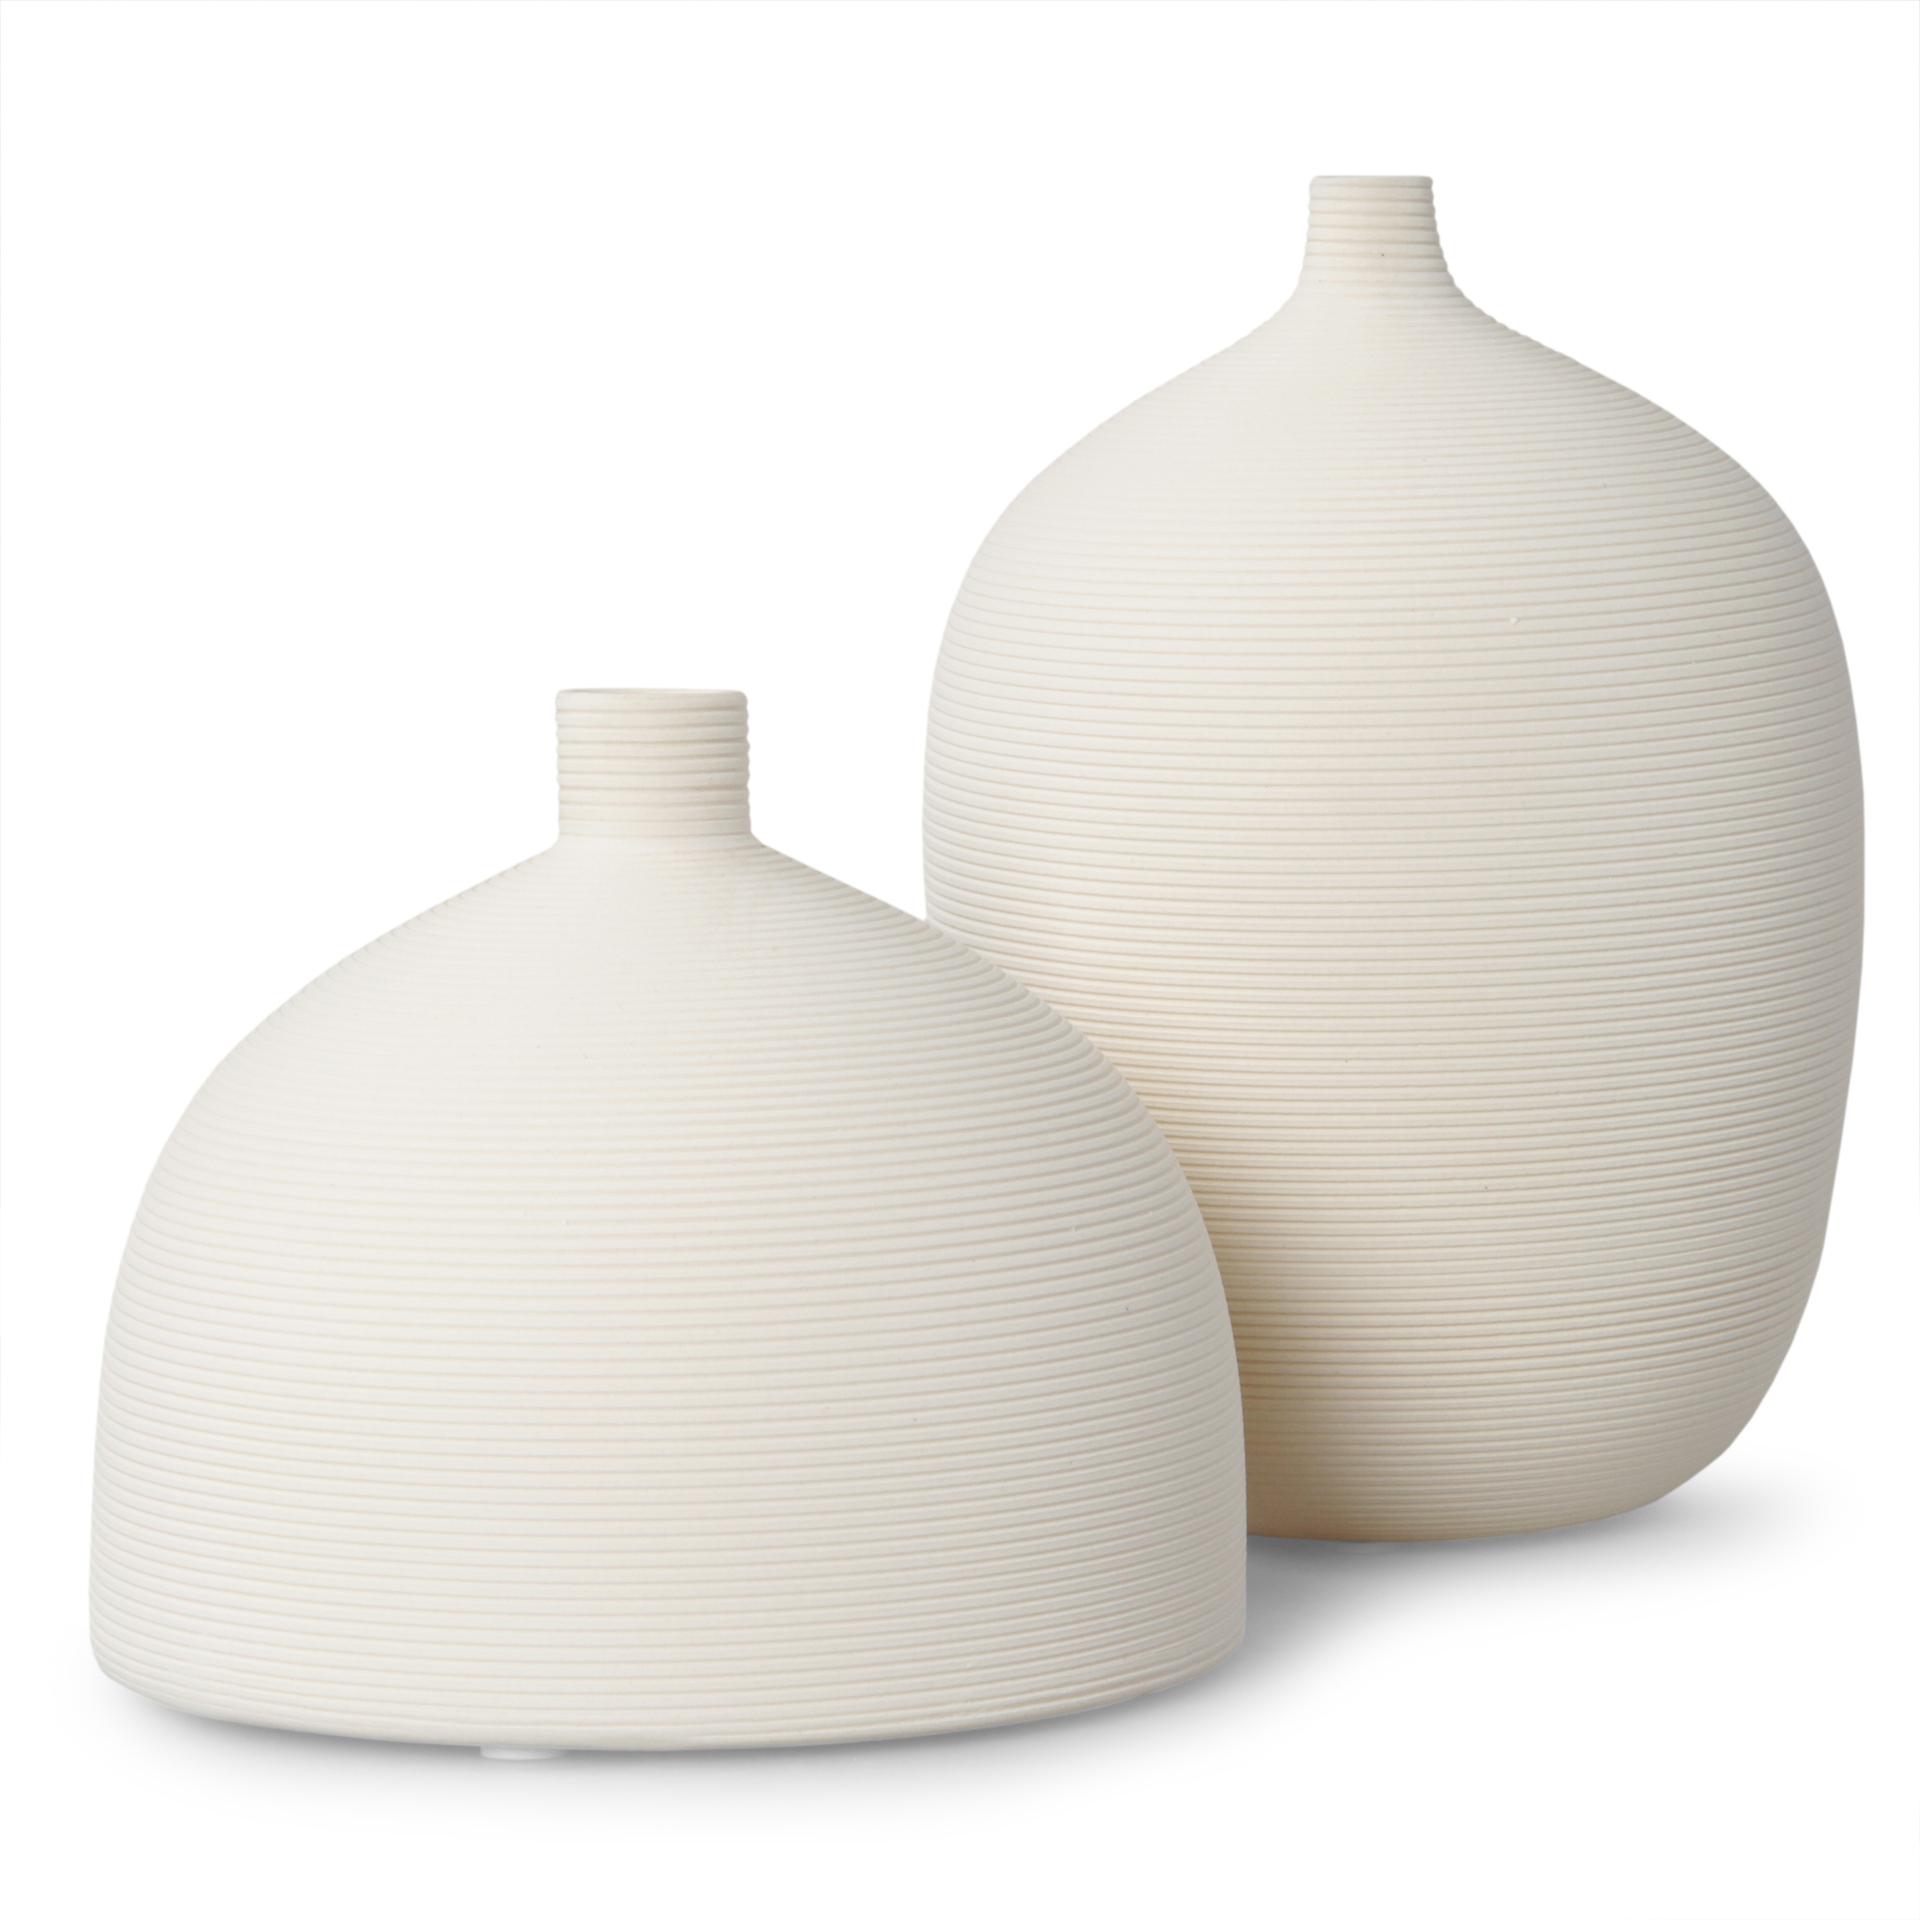 DA89152-Porcelánová váza reliéfna štruktúra